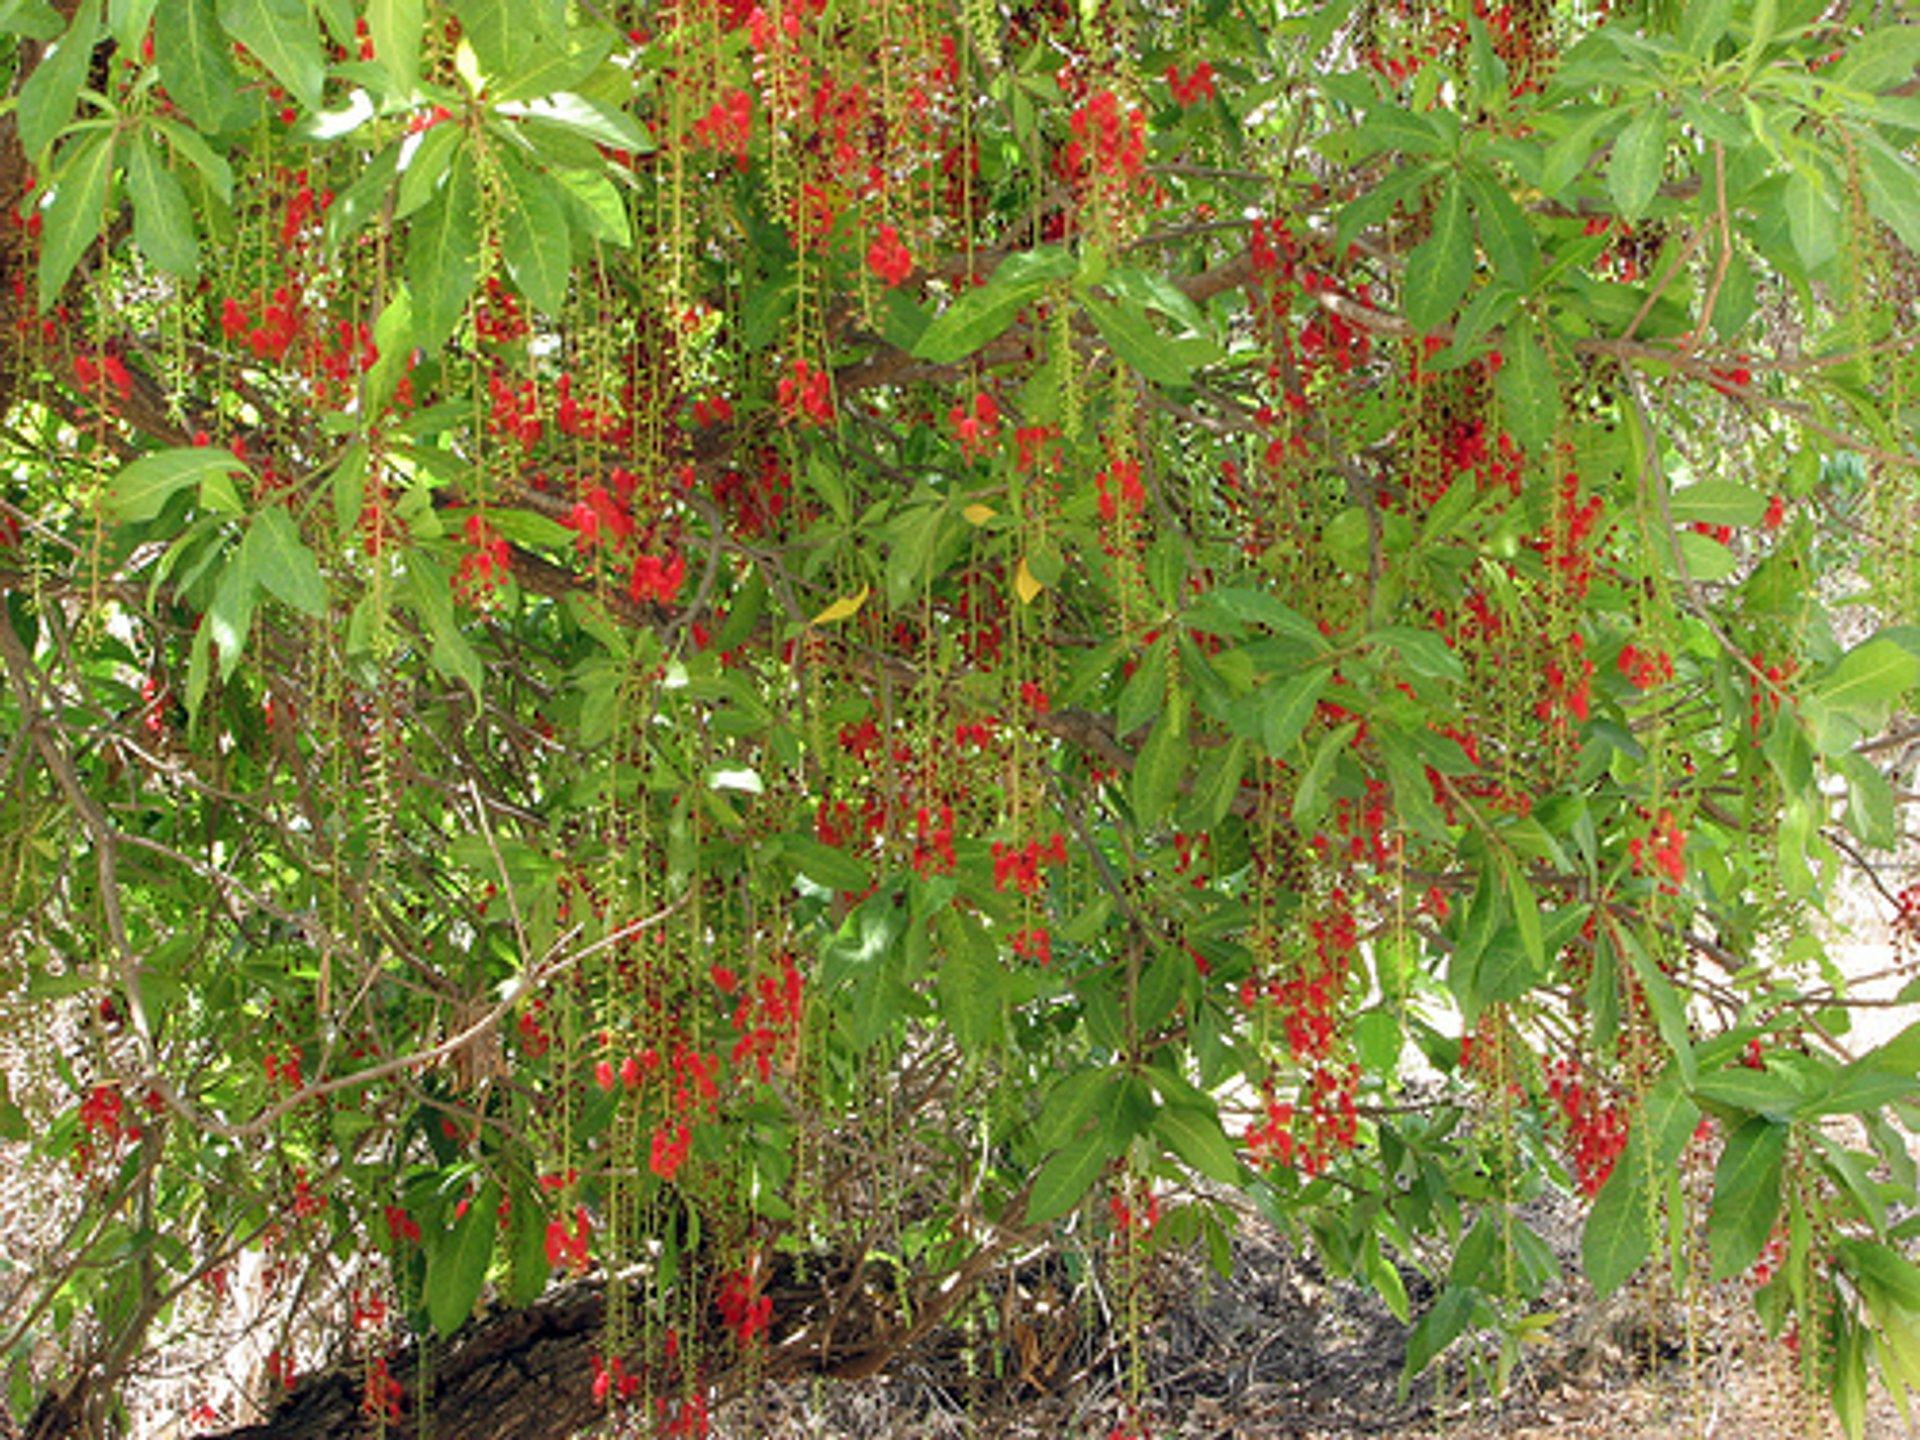 Best time for Sesame Fortune Flower or Lộc Vừng in Vietnam 2020